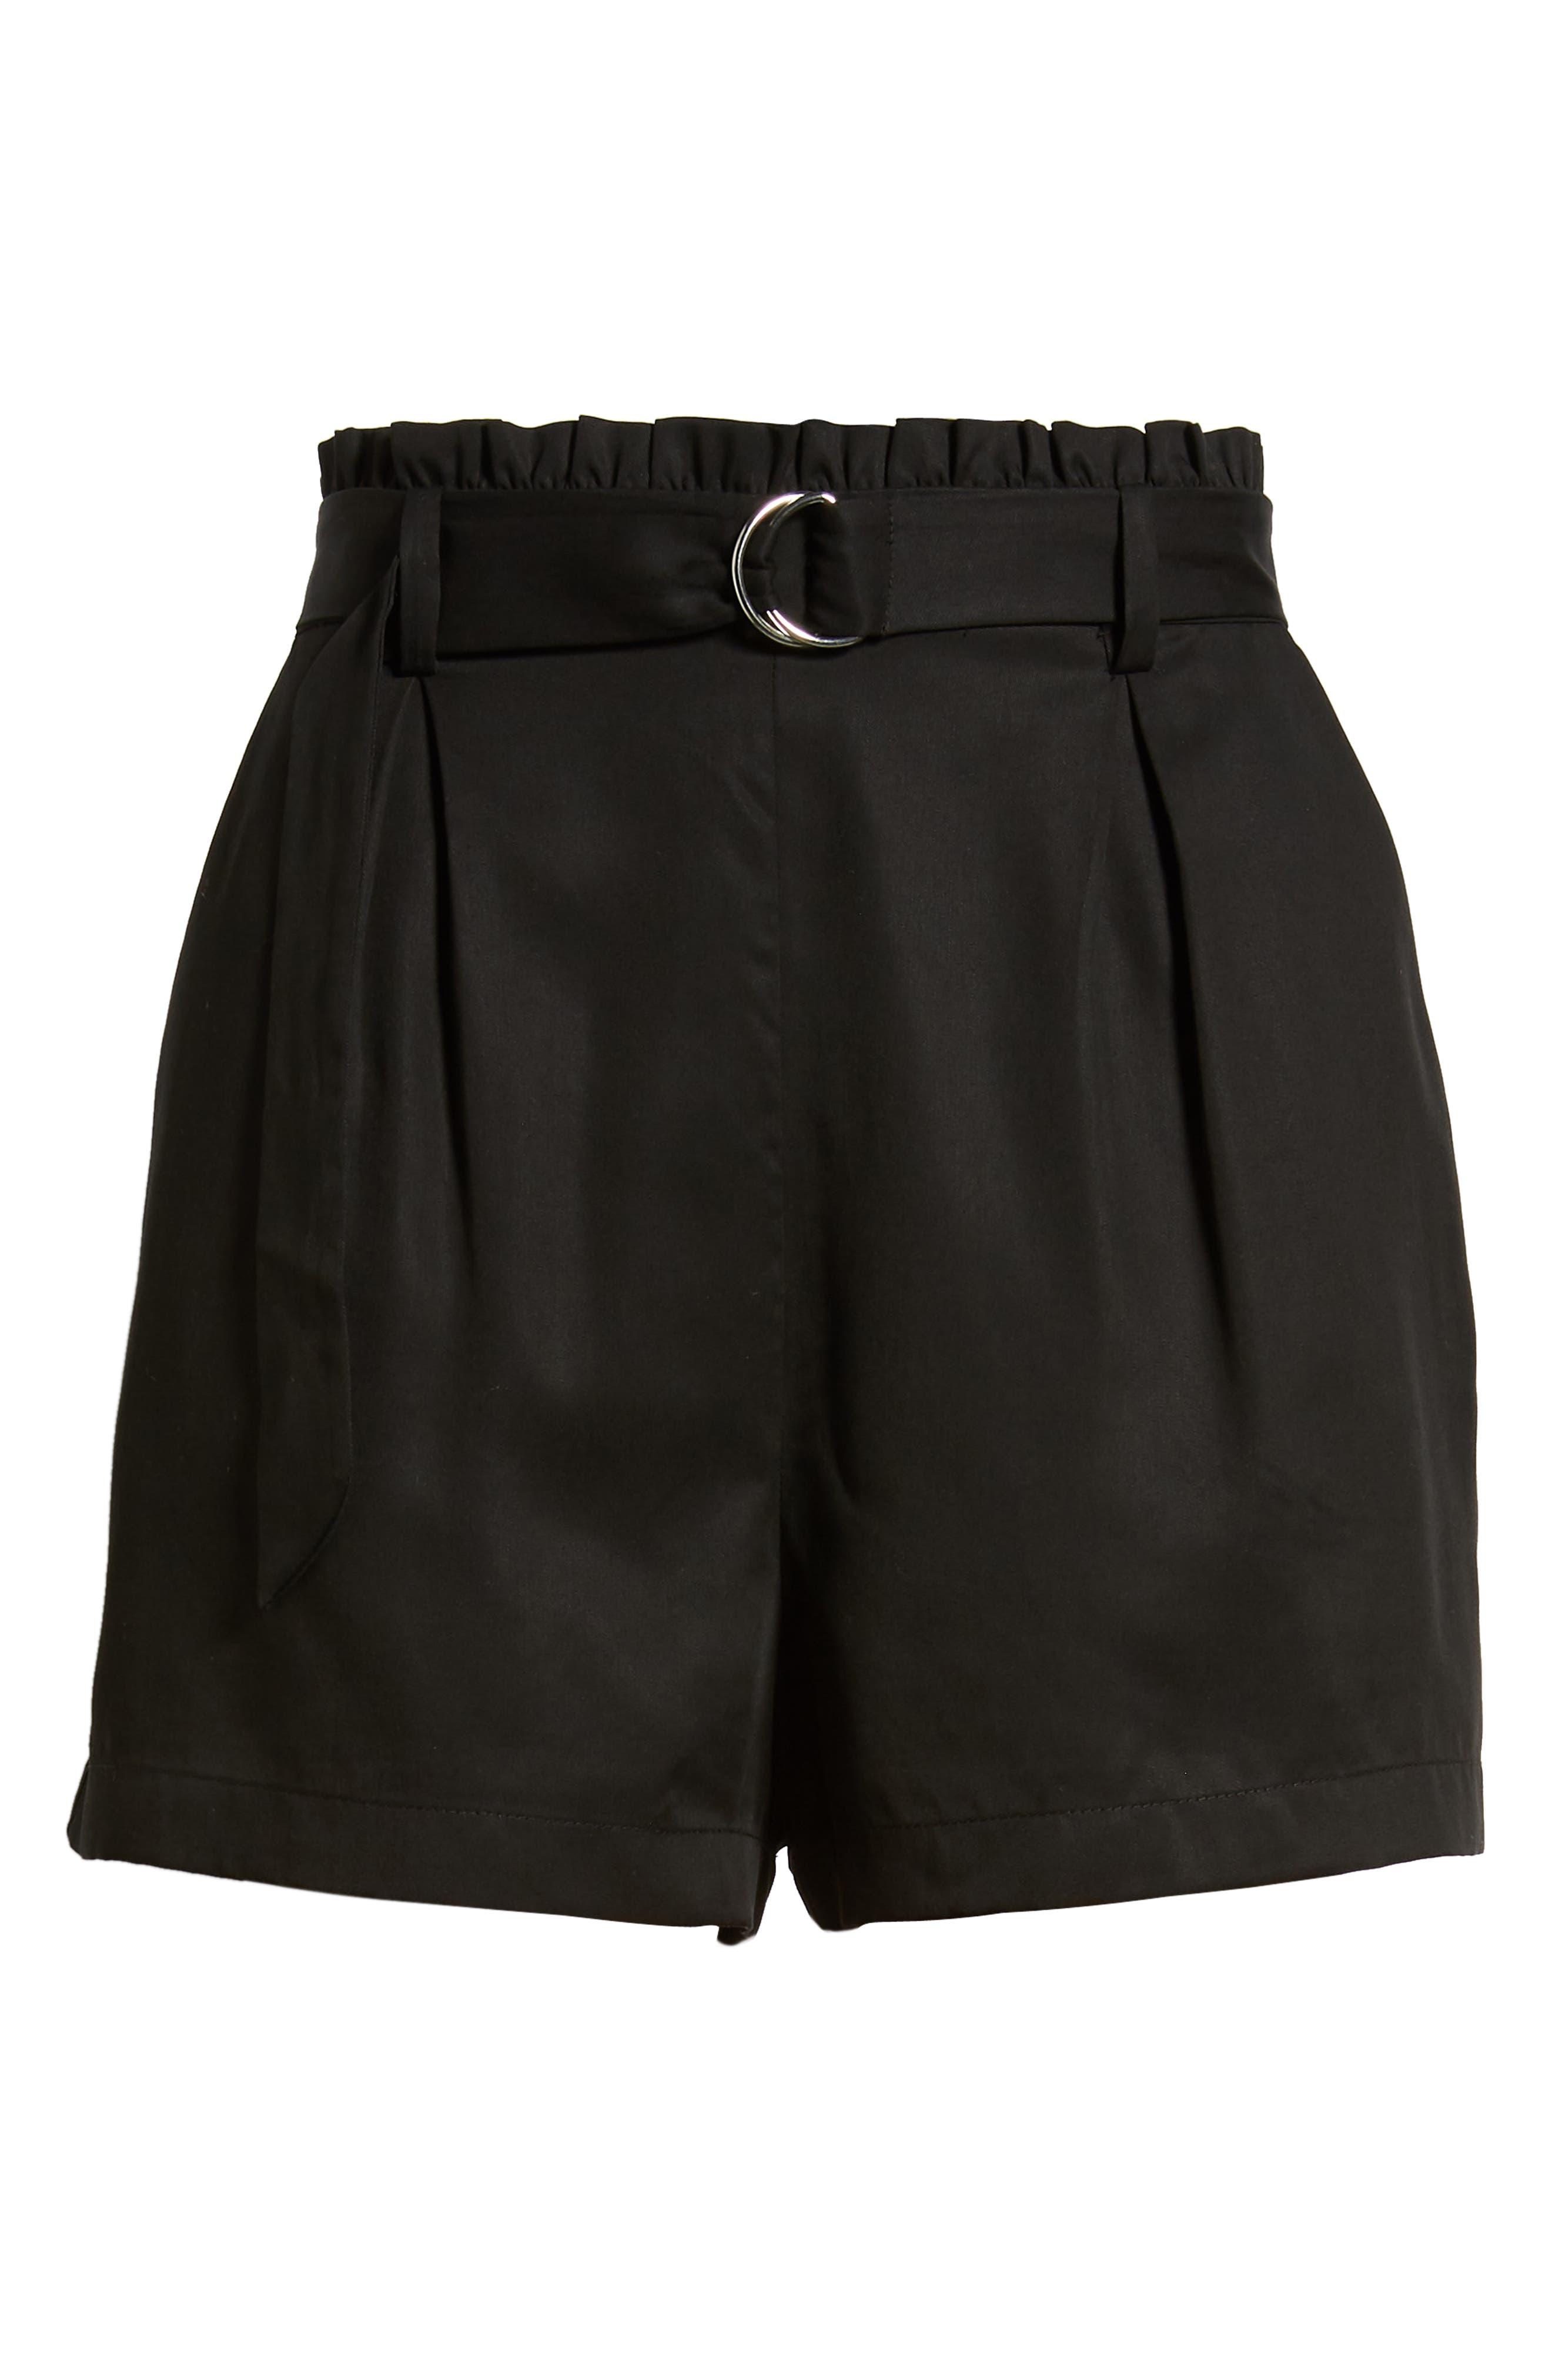 D-Ring Belted Shorts,                             Alternate thumbnail 6, color,                             BLACK